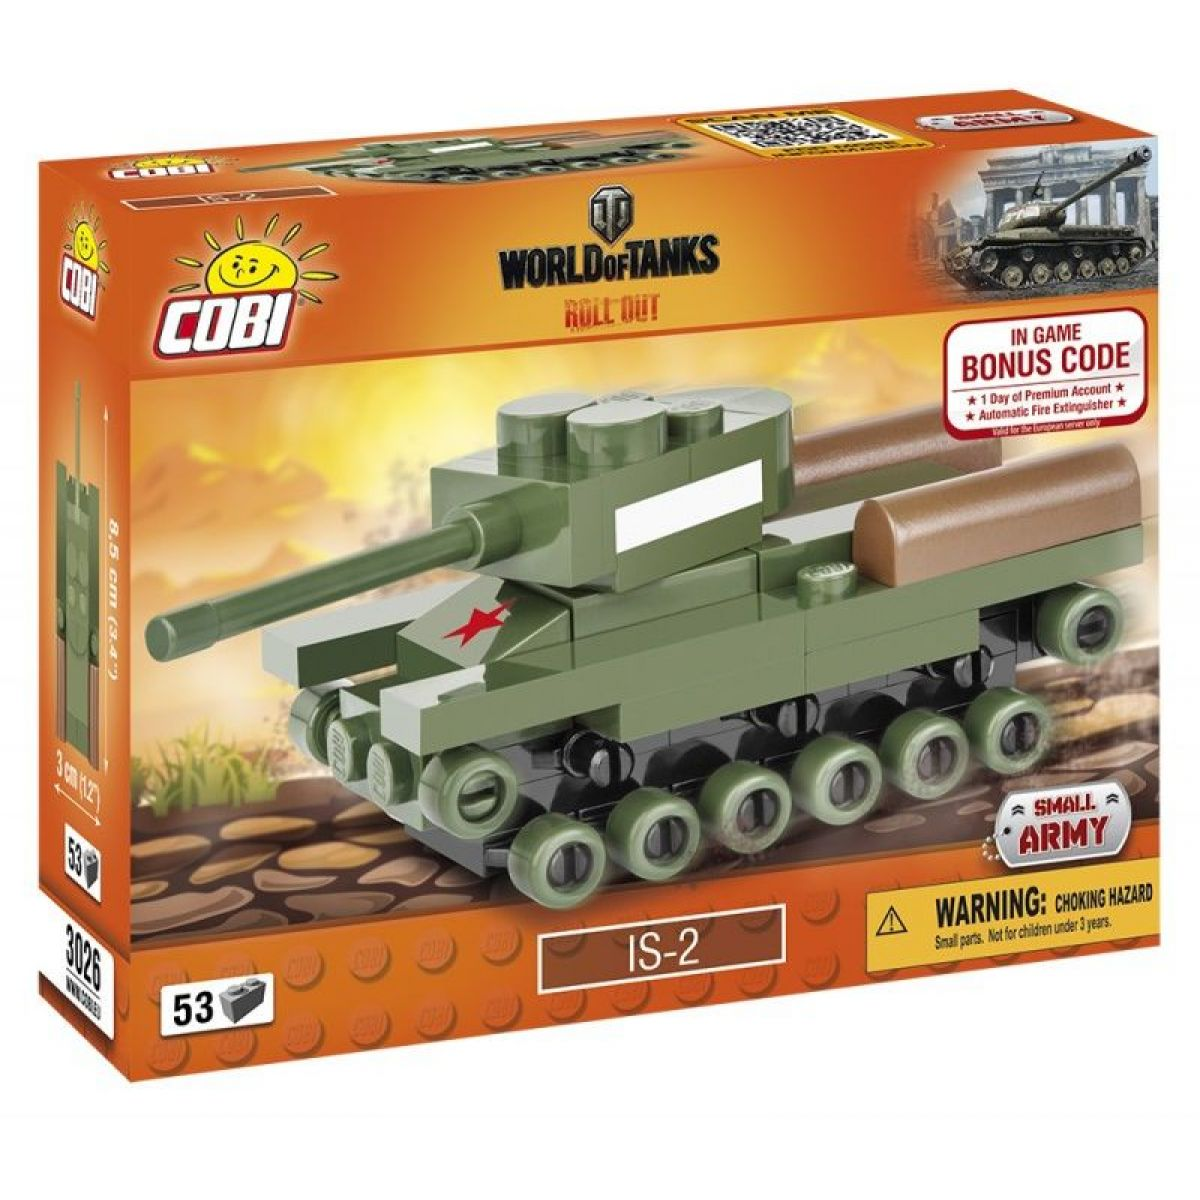 Cobi 3026 World of Tanks Nano Tank IS-2 53 k